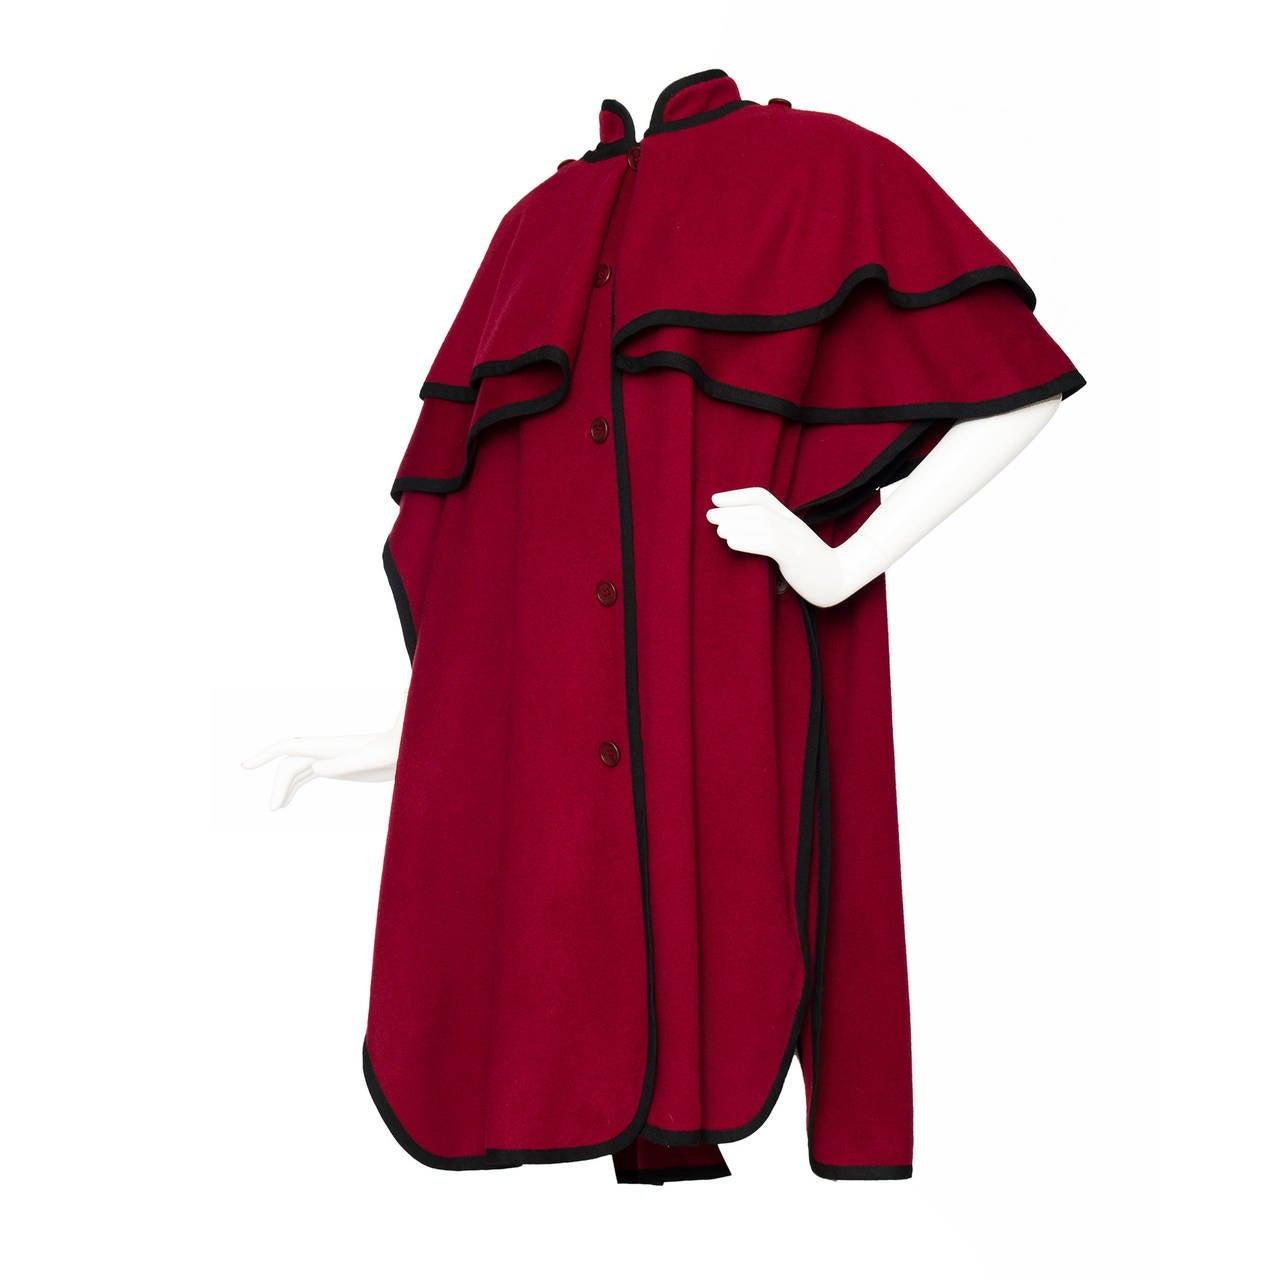 1970s Yves Saint Laurent Burgundy Wool Cape 1